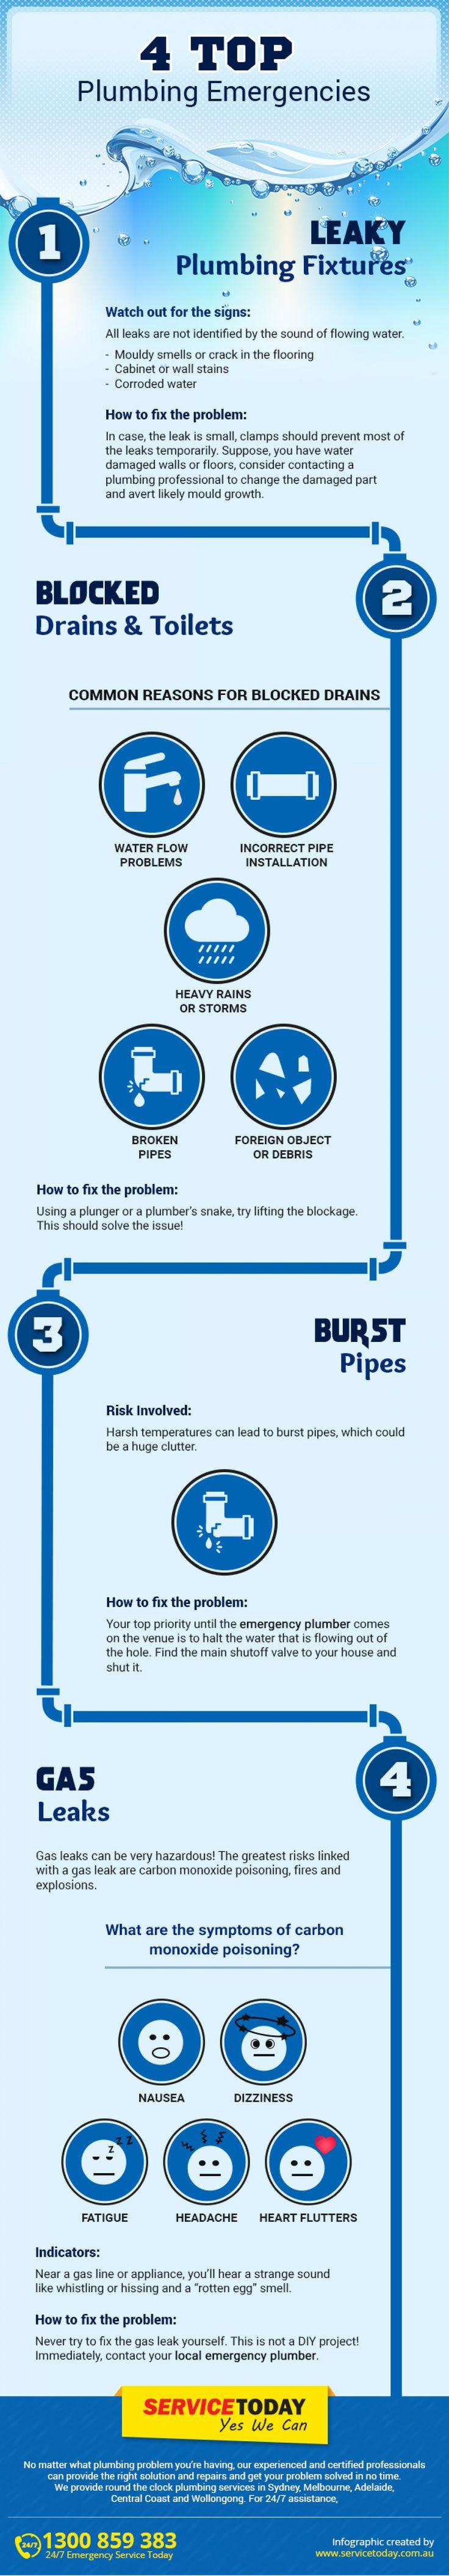 The Top Most #Plumbing Emergencies – InfoGraphic    #plumbingtips #plumber #plumbingsolution #leakytaps  #BlockedDrains #CloggedToilets #LeakyPipes #PlumbingEmergency